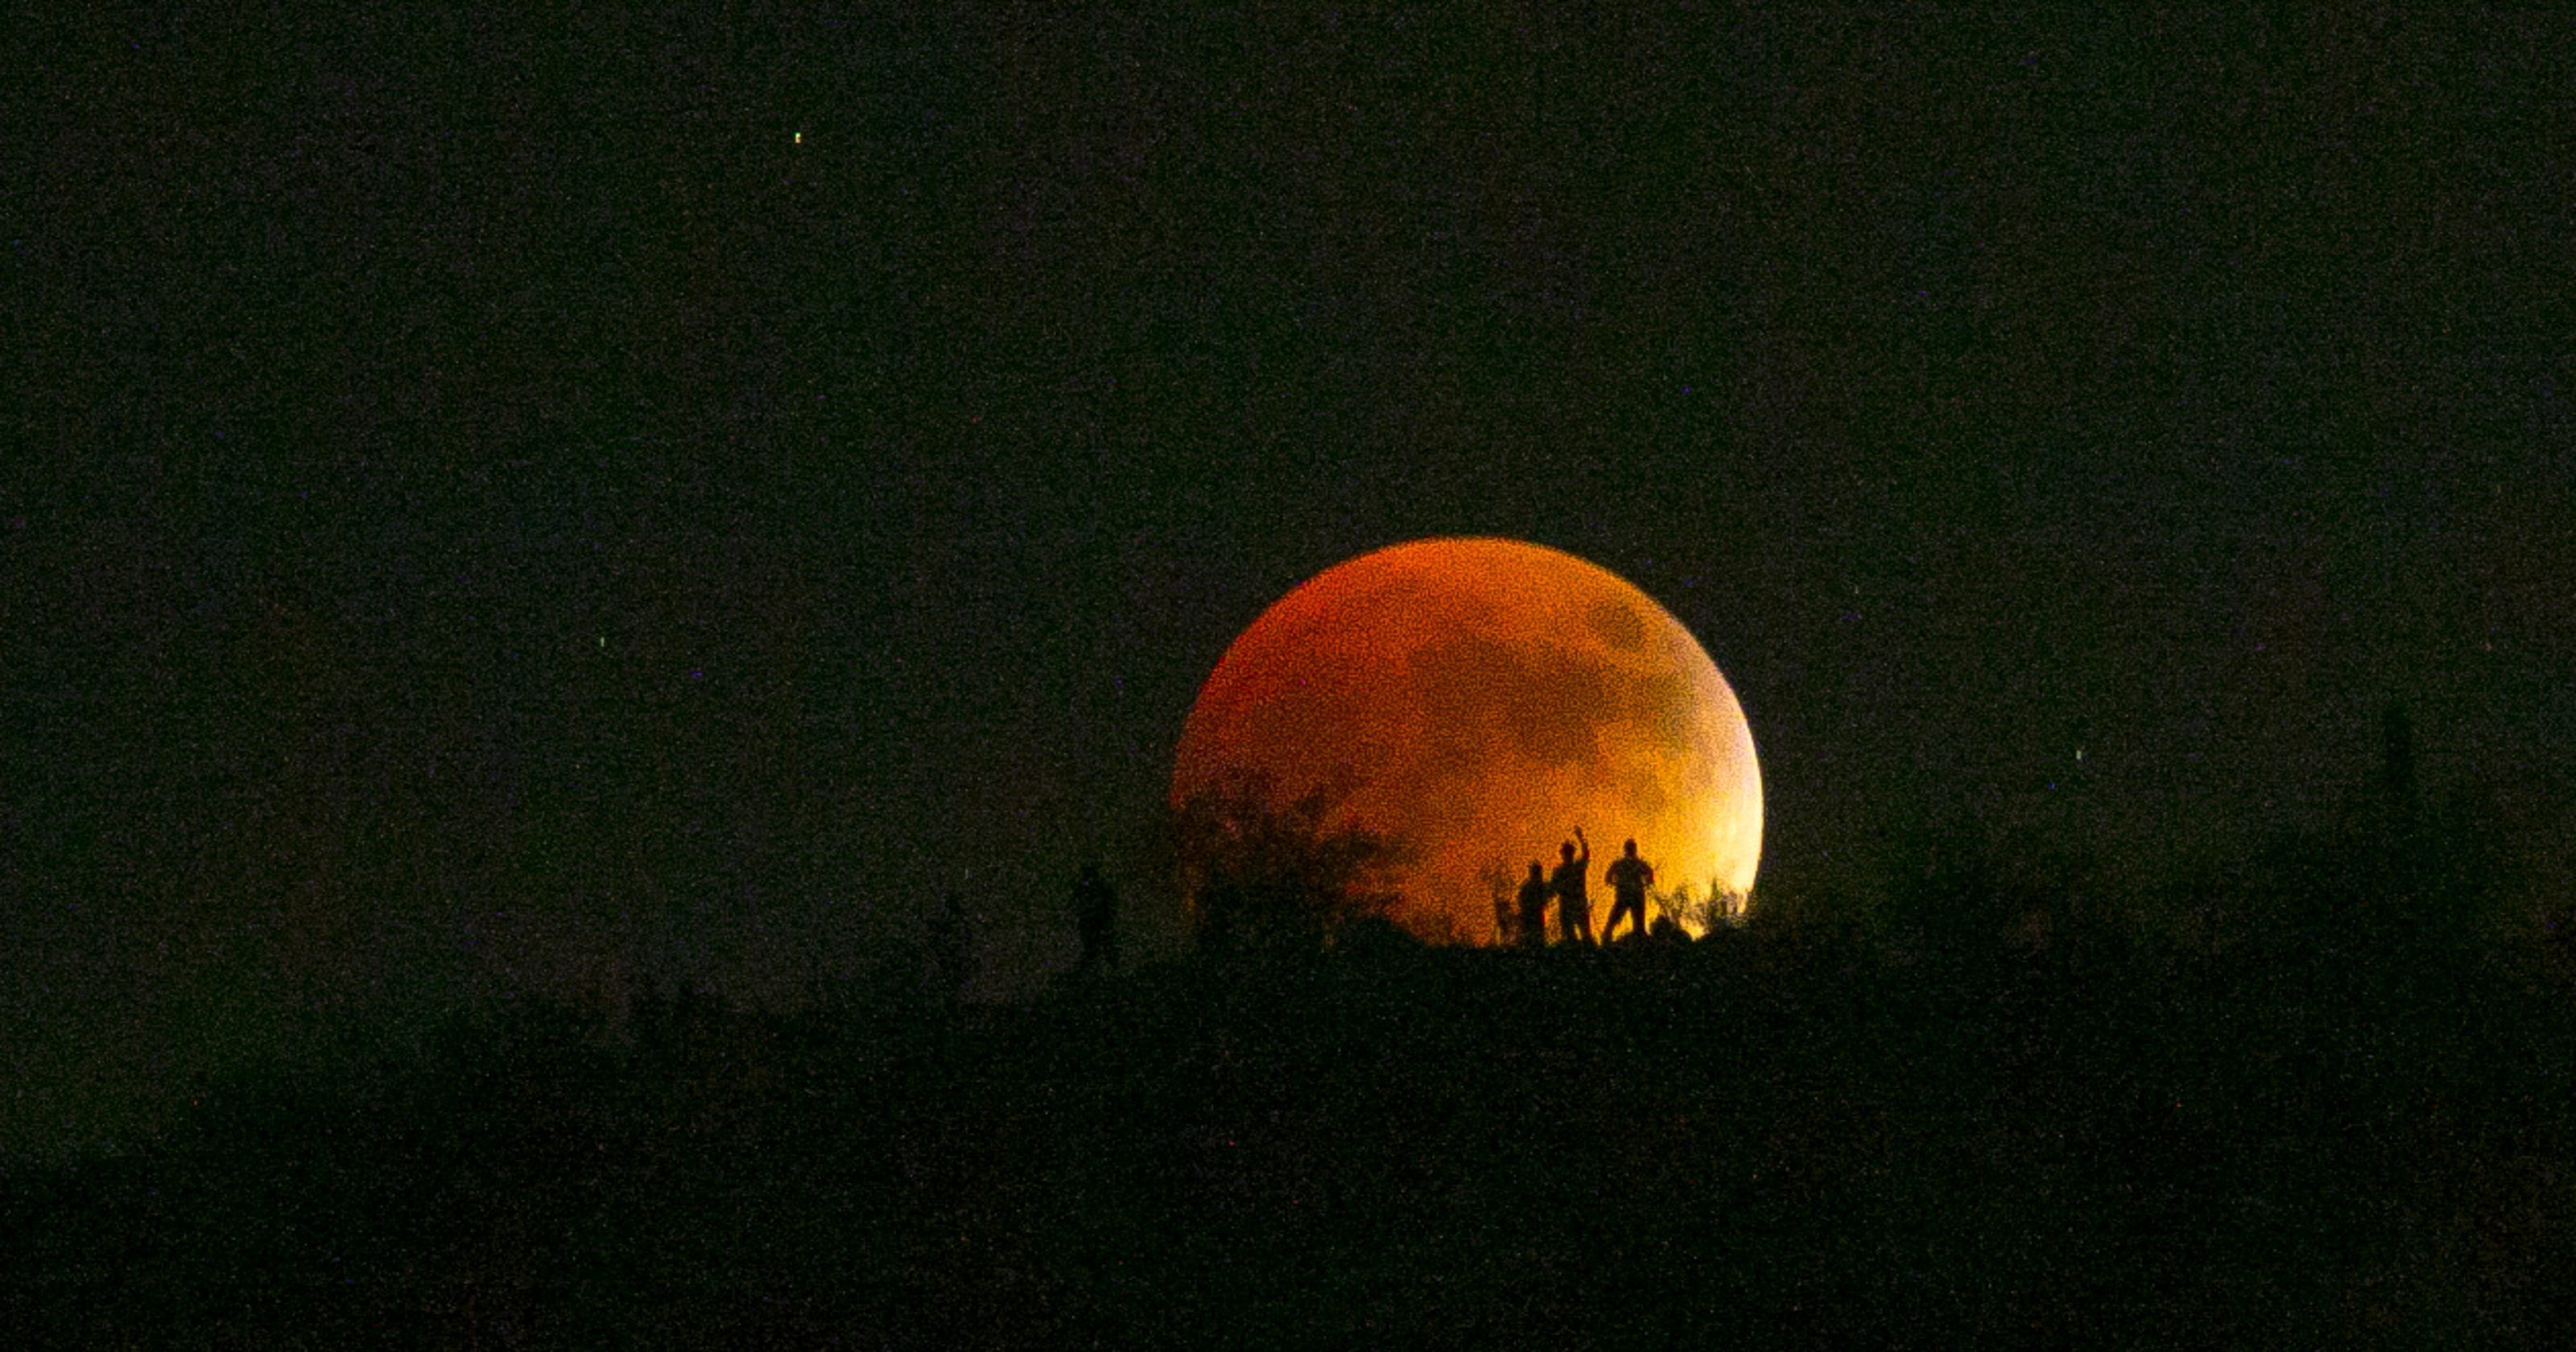 blood moon 2019 arizona time - photo #19